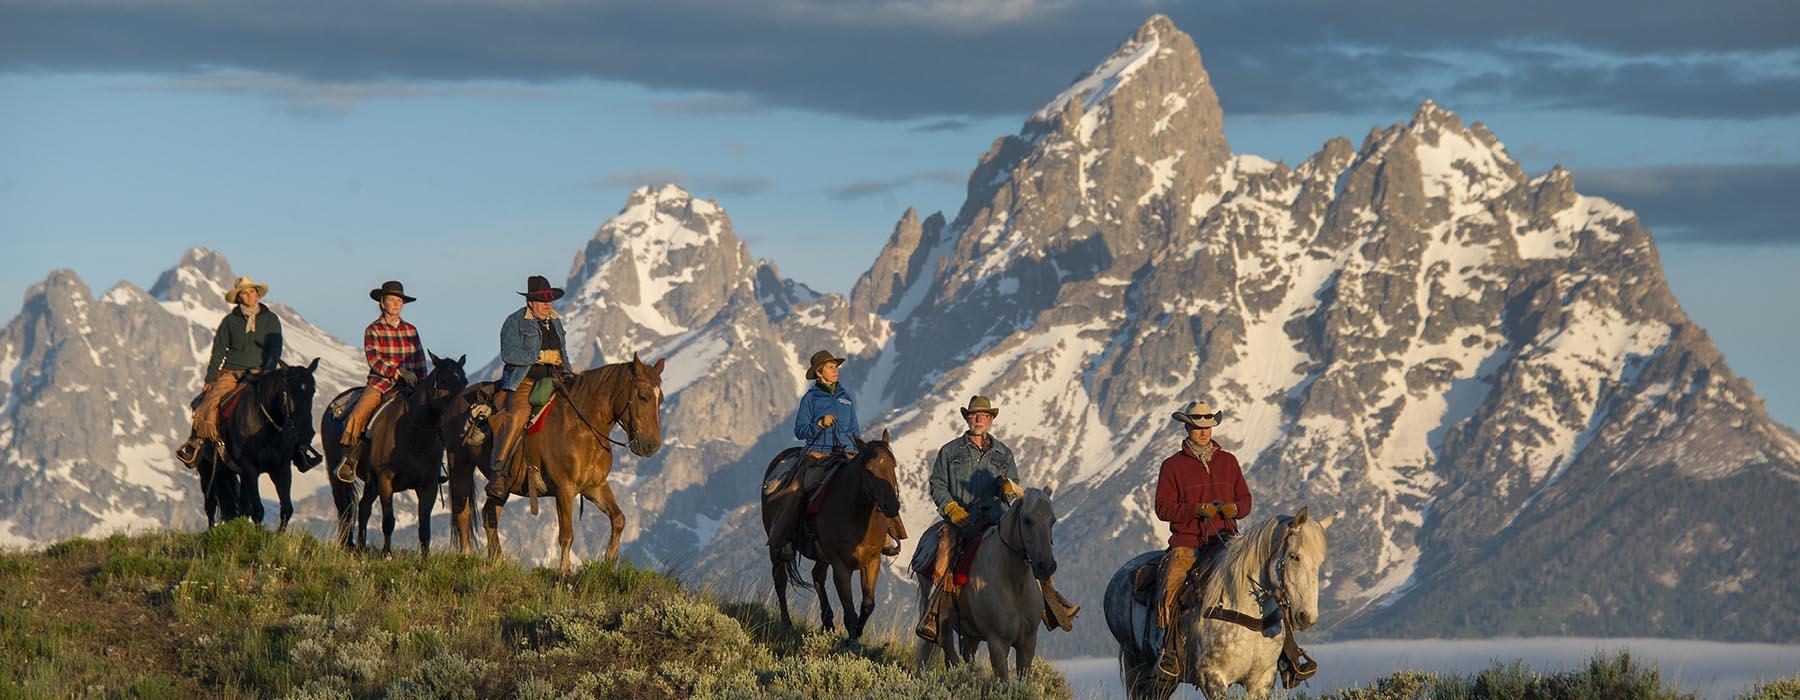 Horseback riders overlooking mountains.